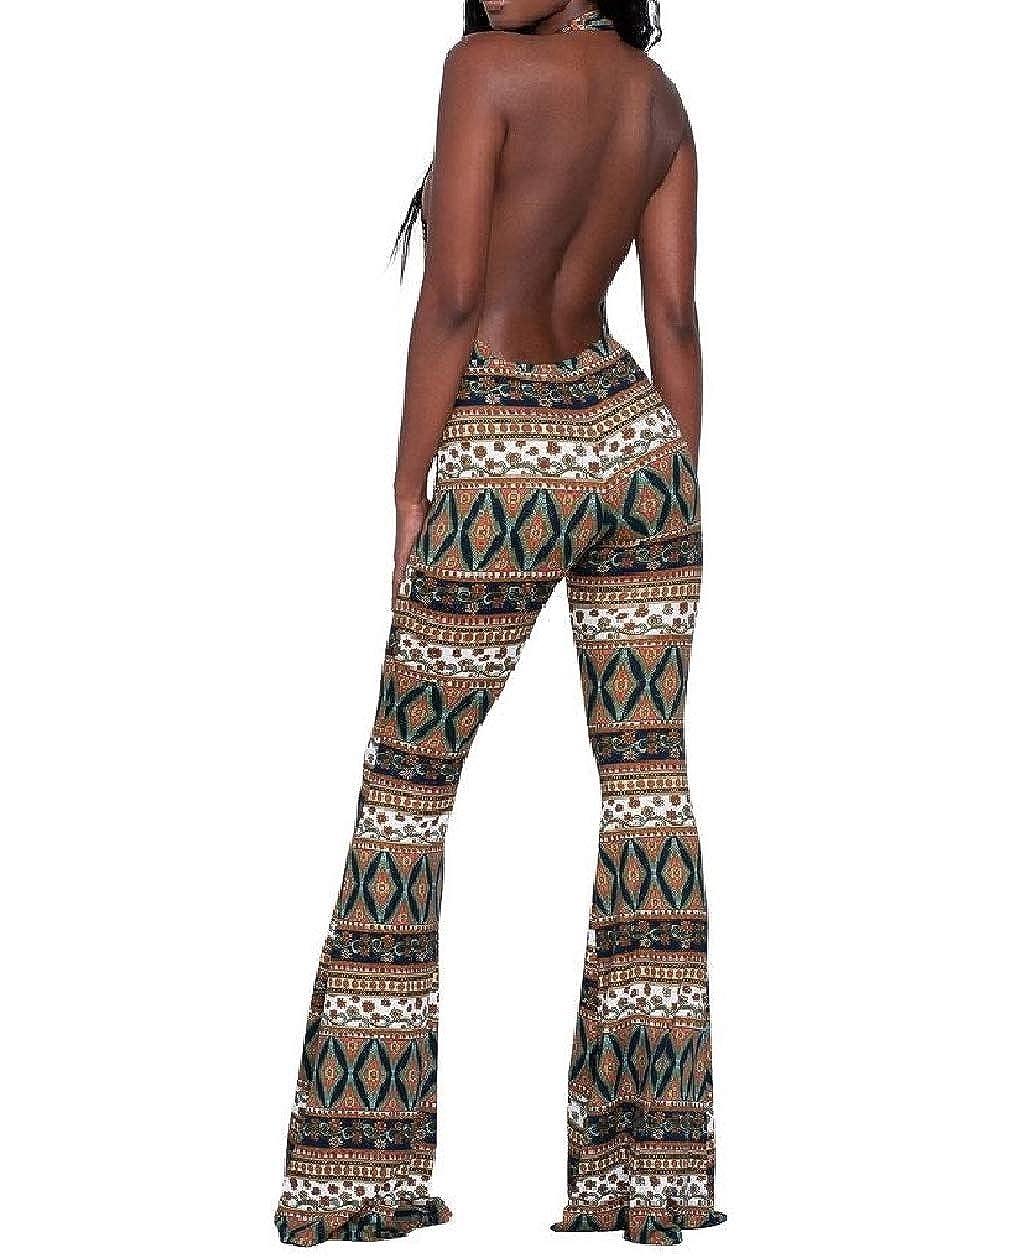 Zimaes-Women Wide Leg Halter Floral Printed Sleeveless Formal Jumpsuit